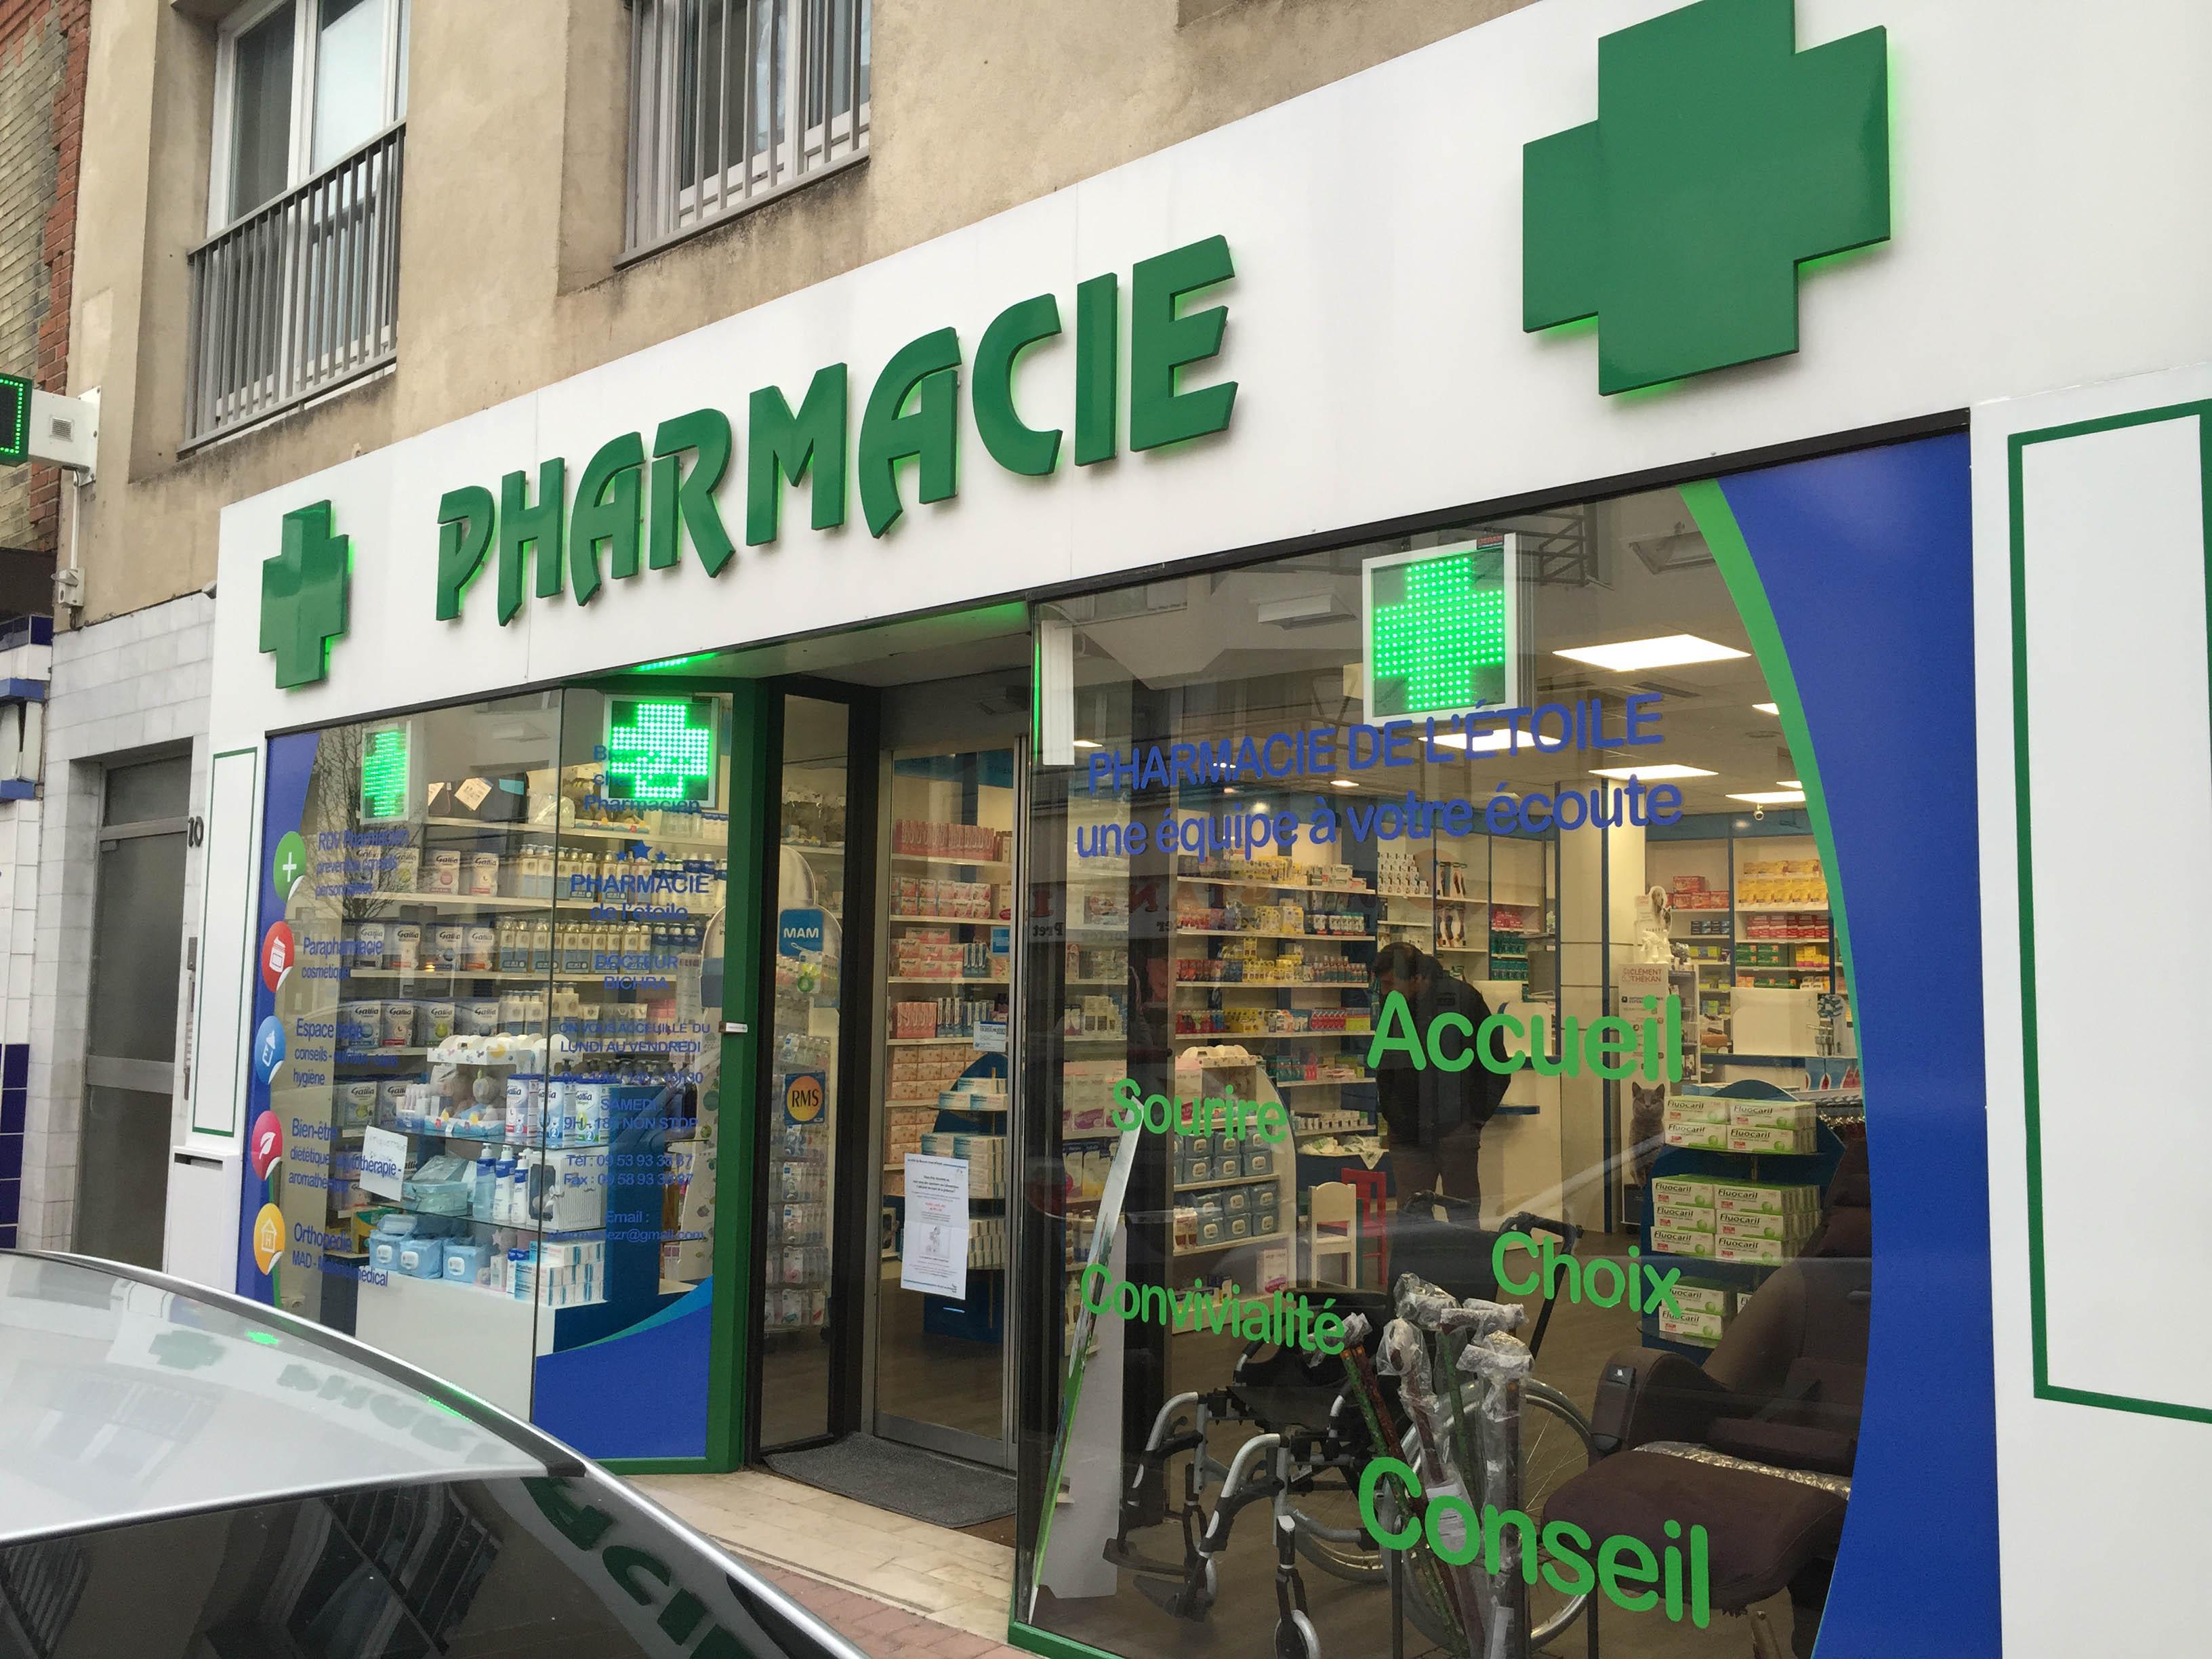 croix led pharmacie